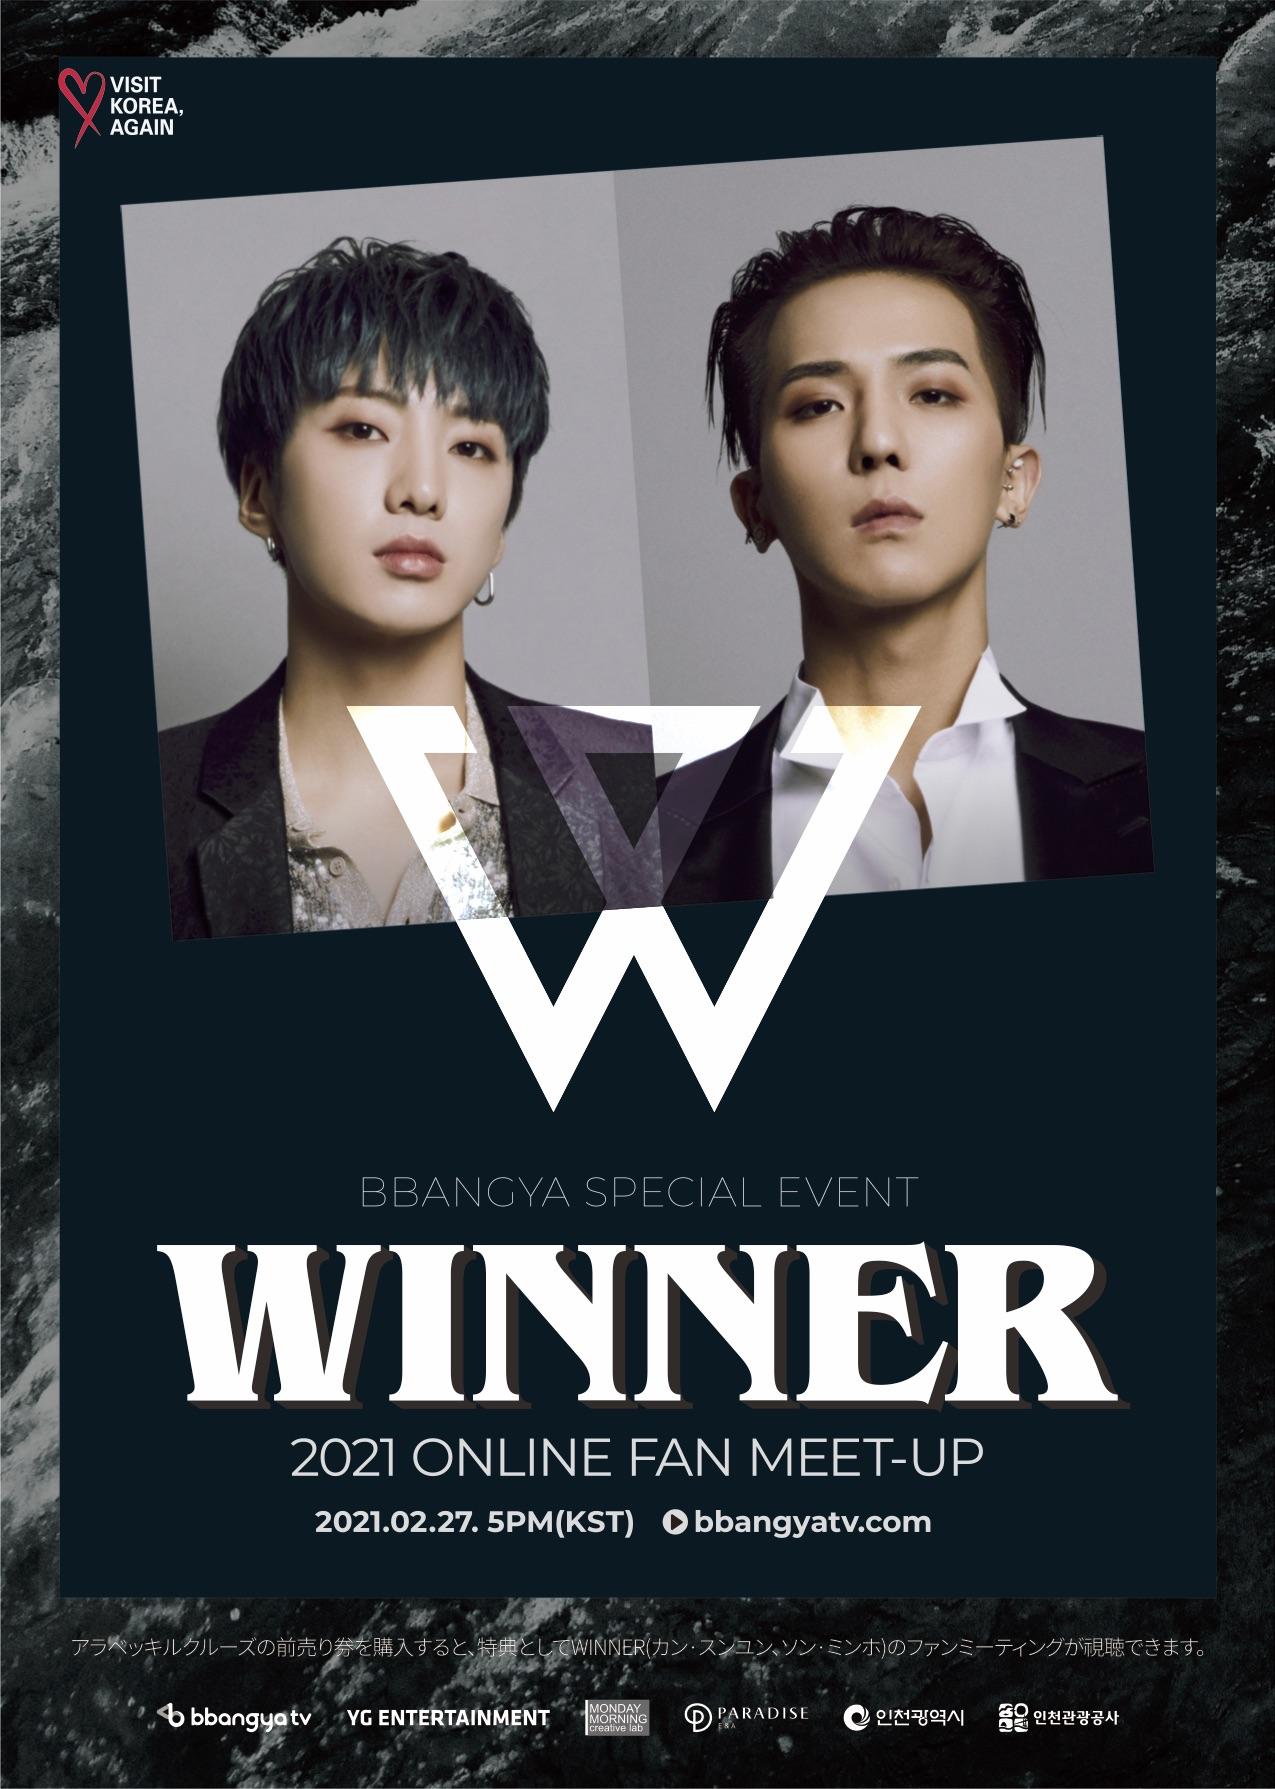 2021 BBANGYA SPECIAL EVENT WITH WINNER(カン・スンユン、ソン・ミンホ)